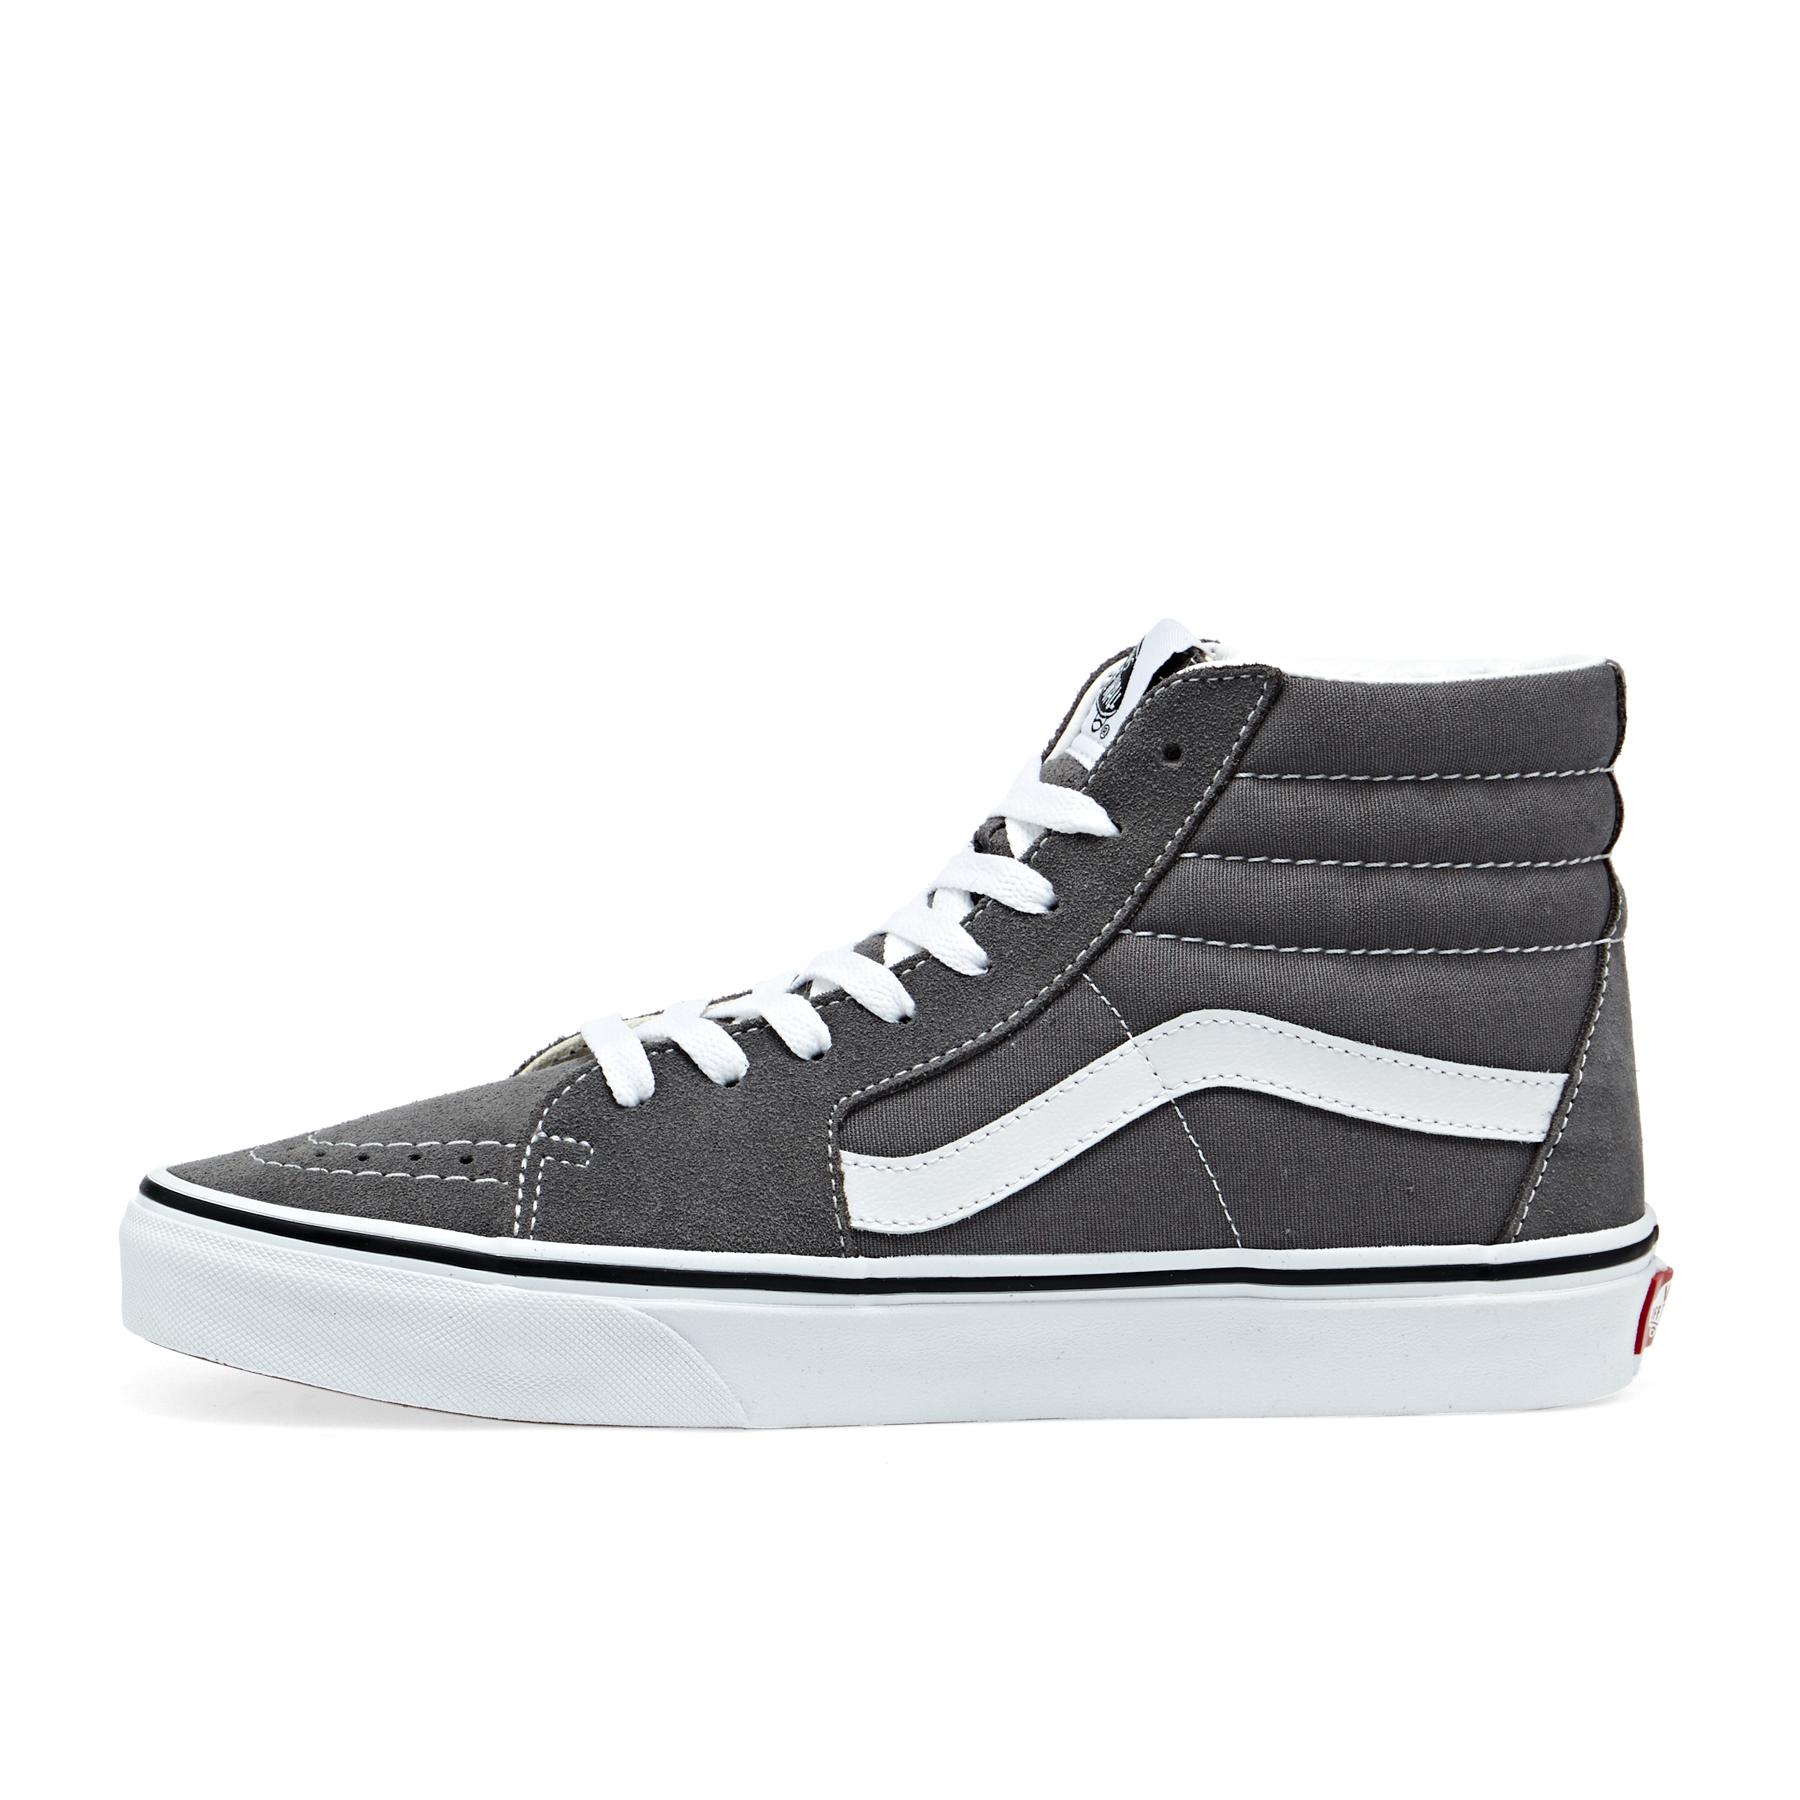 Sapatos Vans Sk8 Hi disponível na Blackleaf